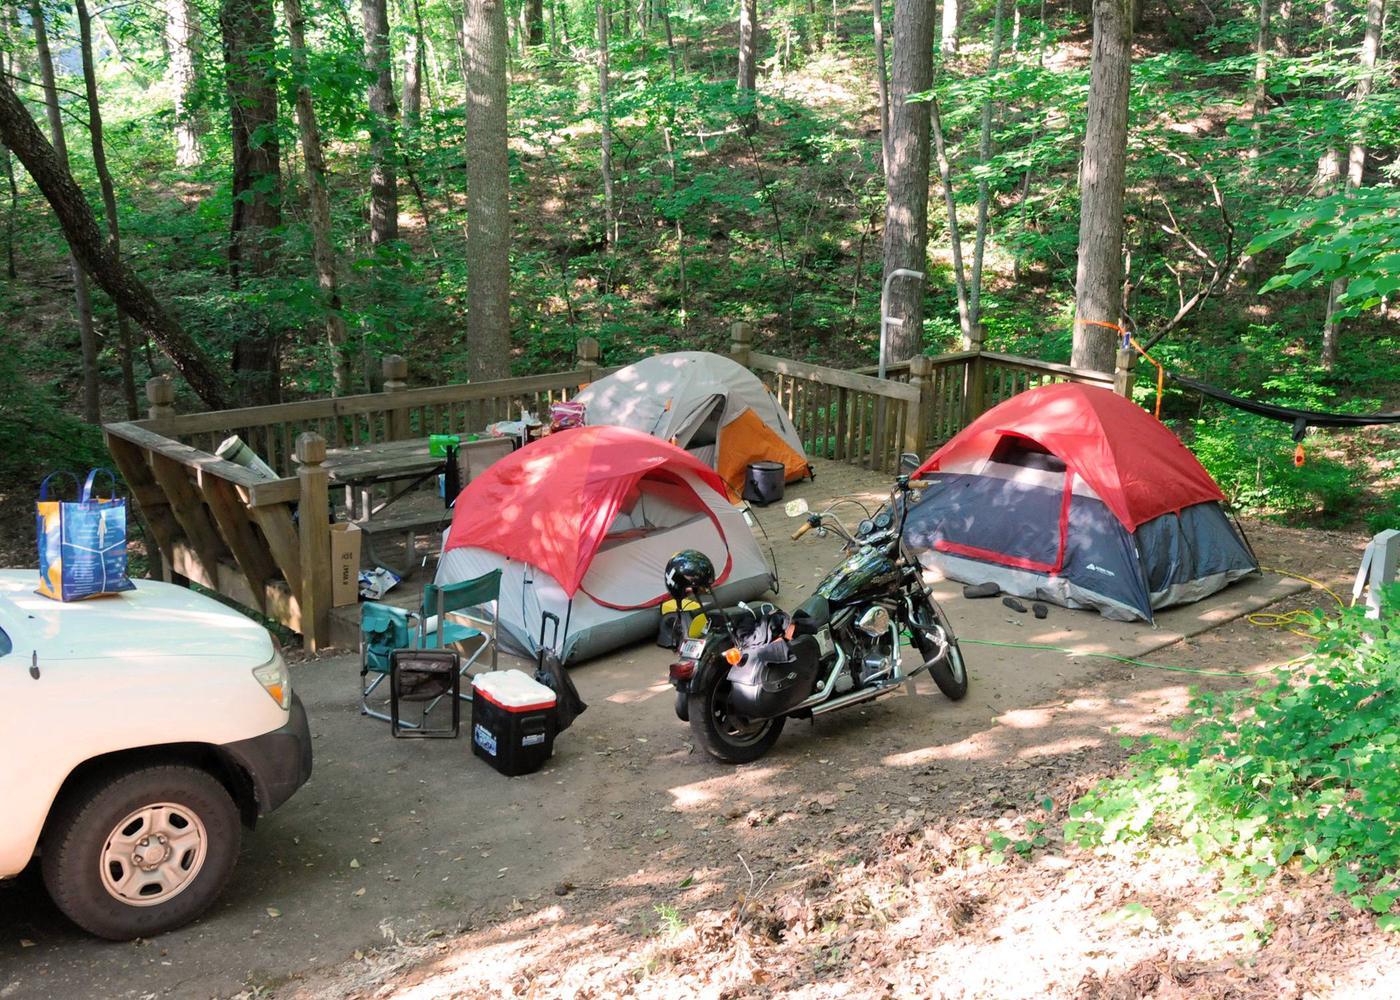 Campsite view.Upper Stamp Creek Campground, campsite 6